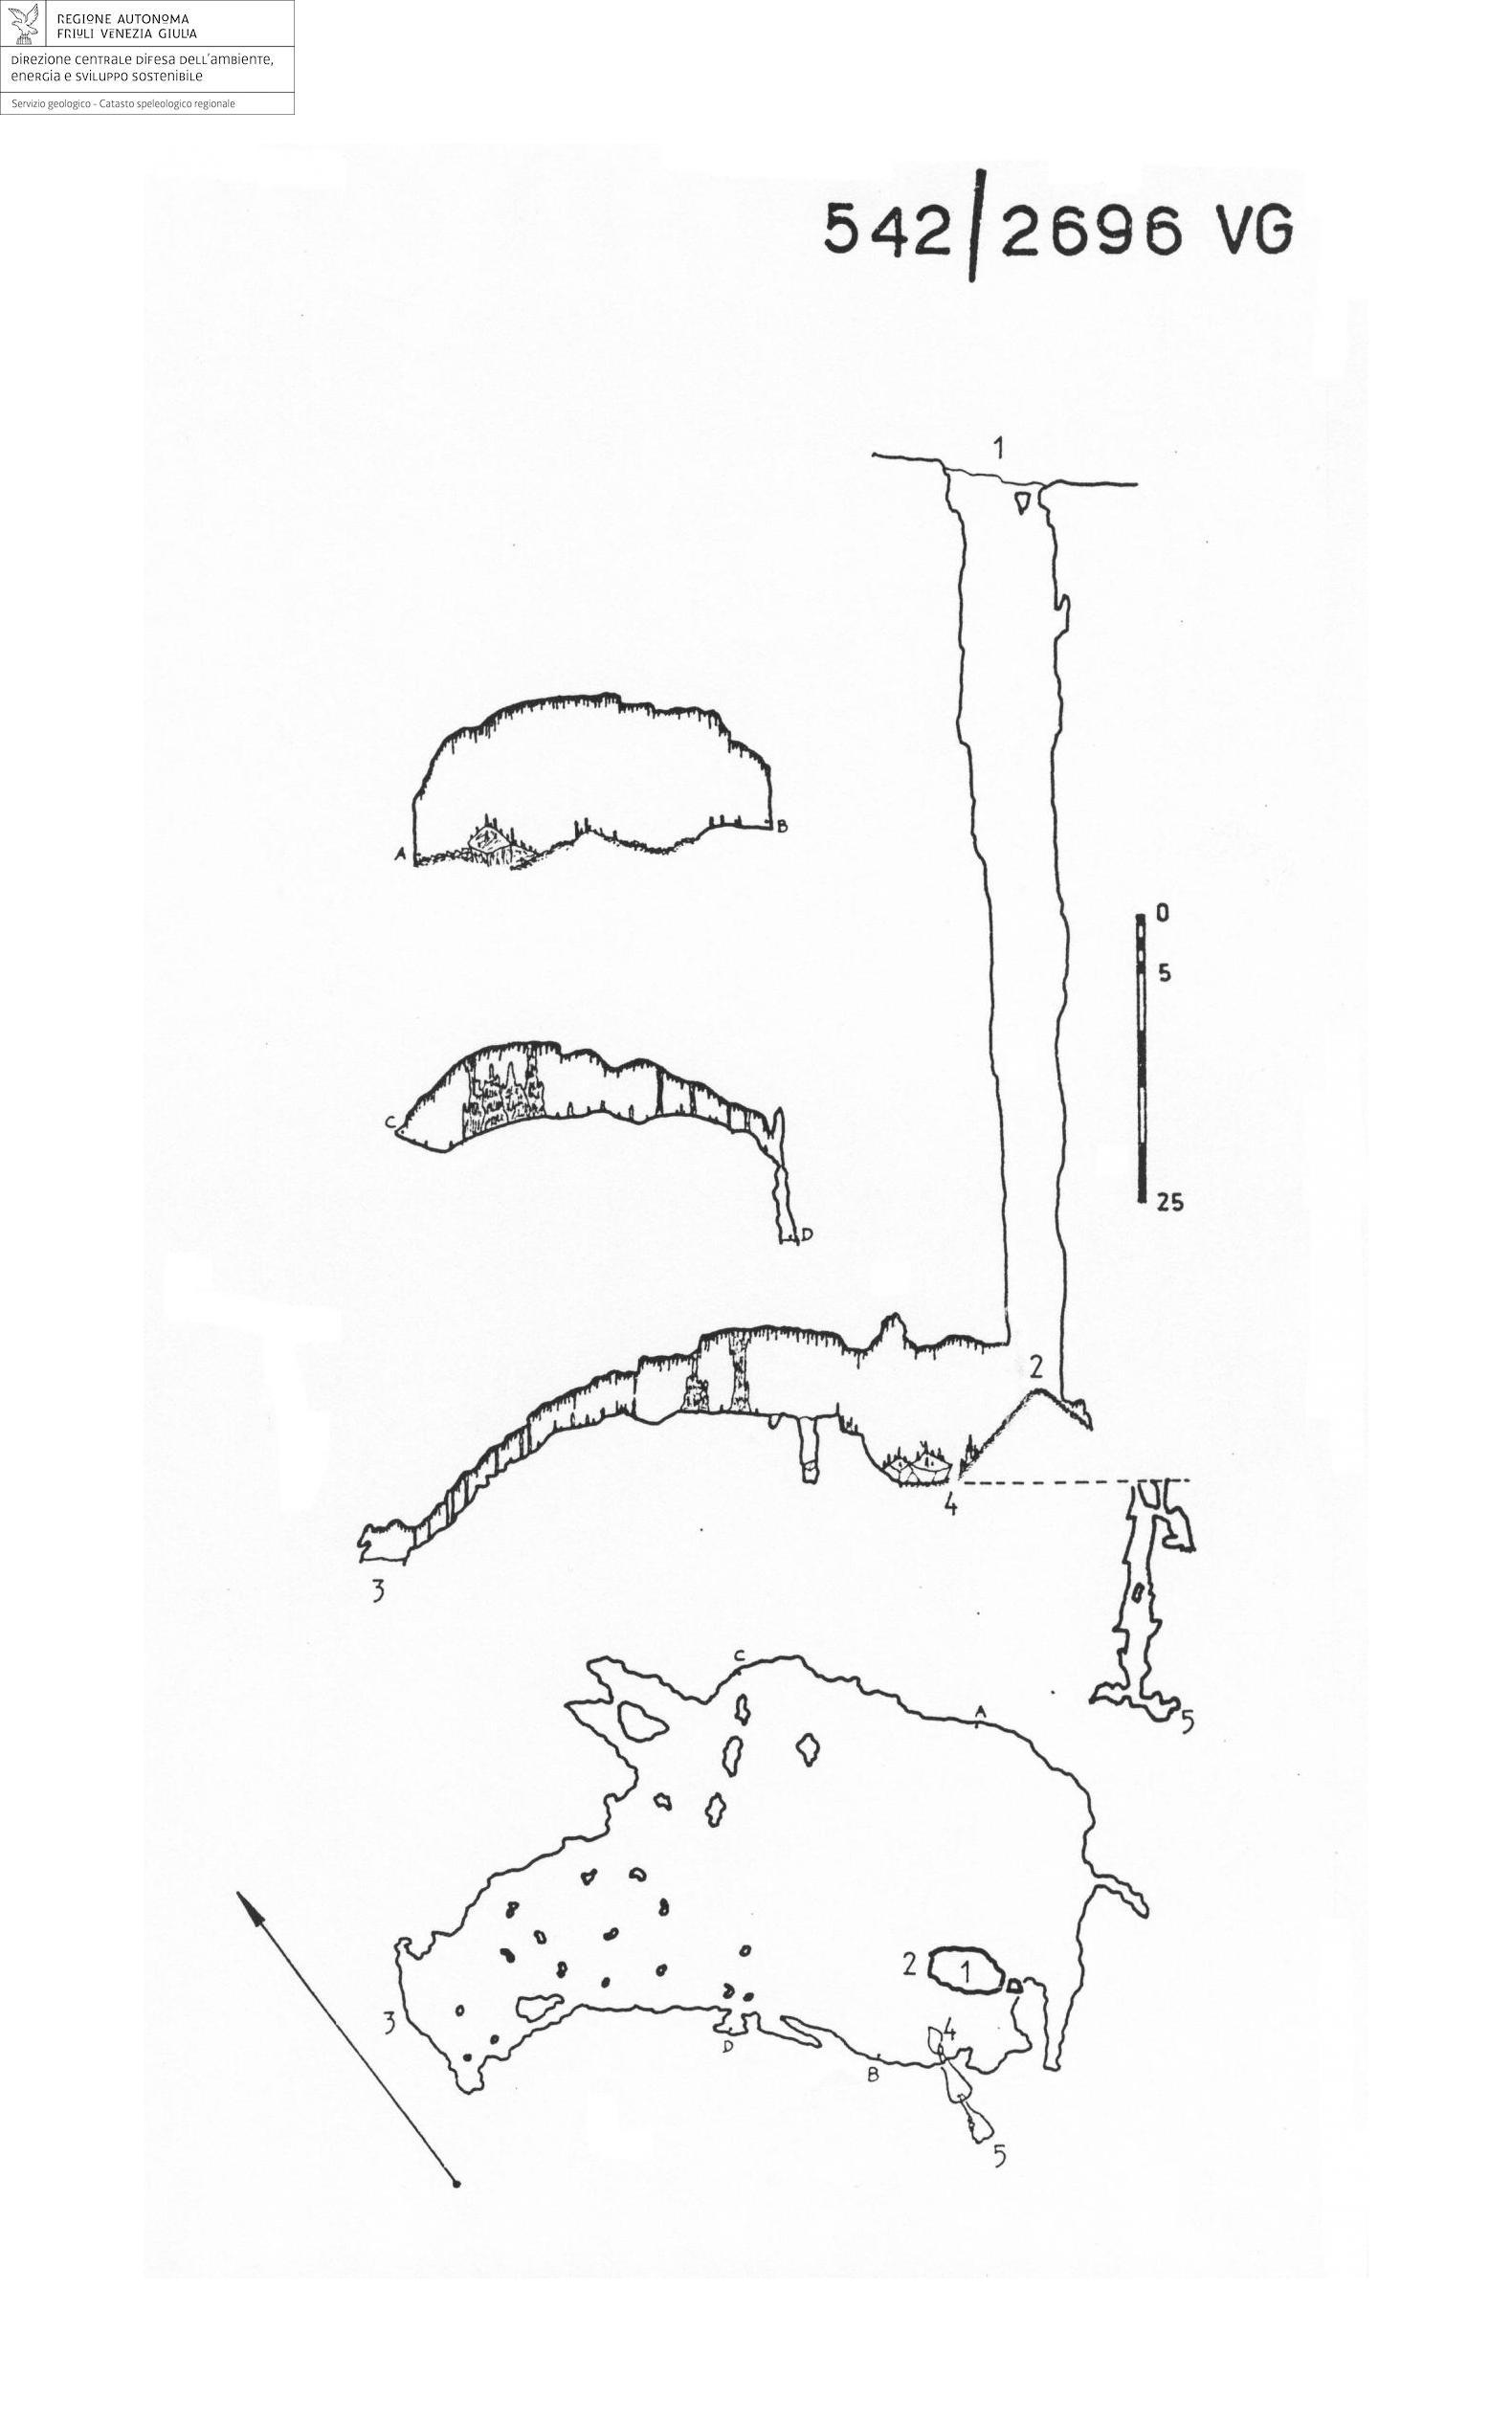 Grotta dell'Elmo